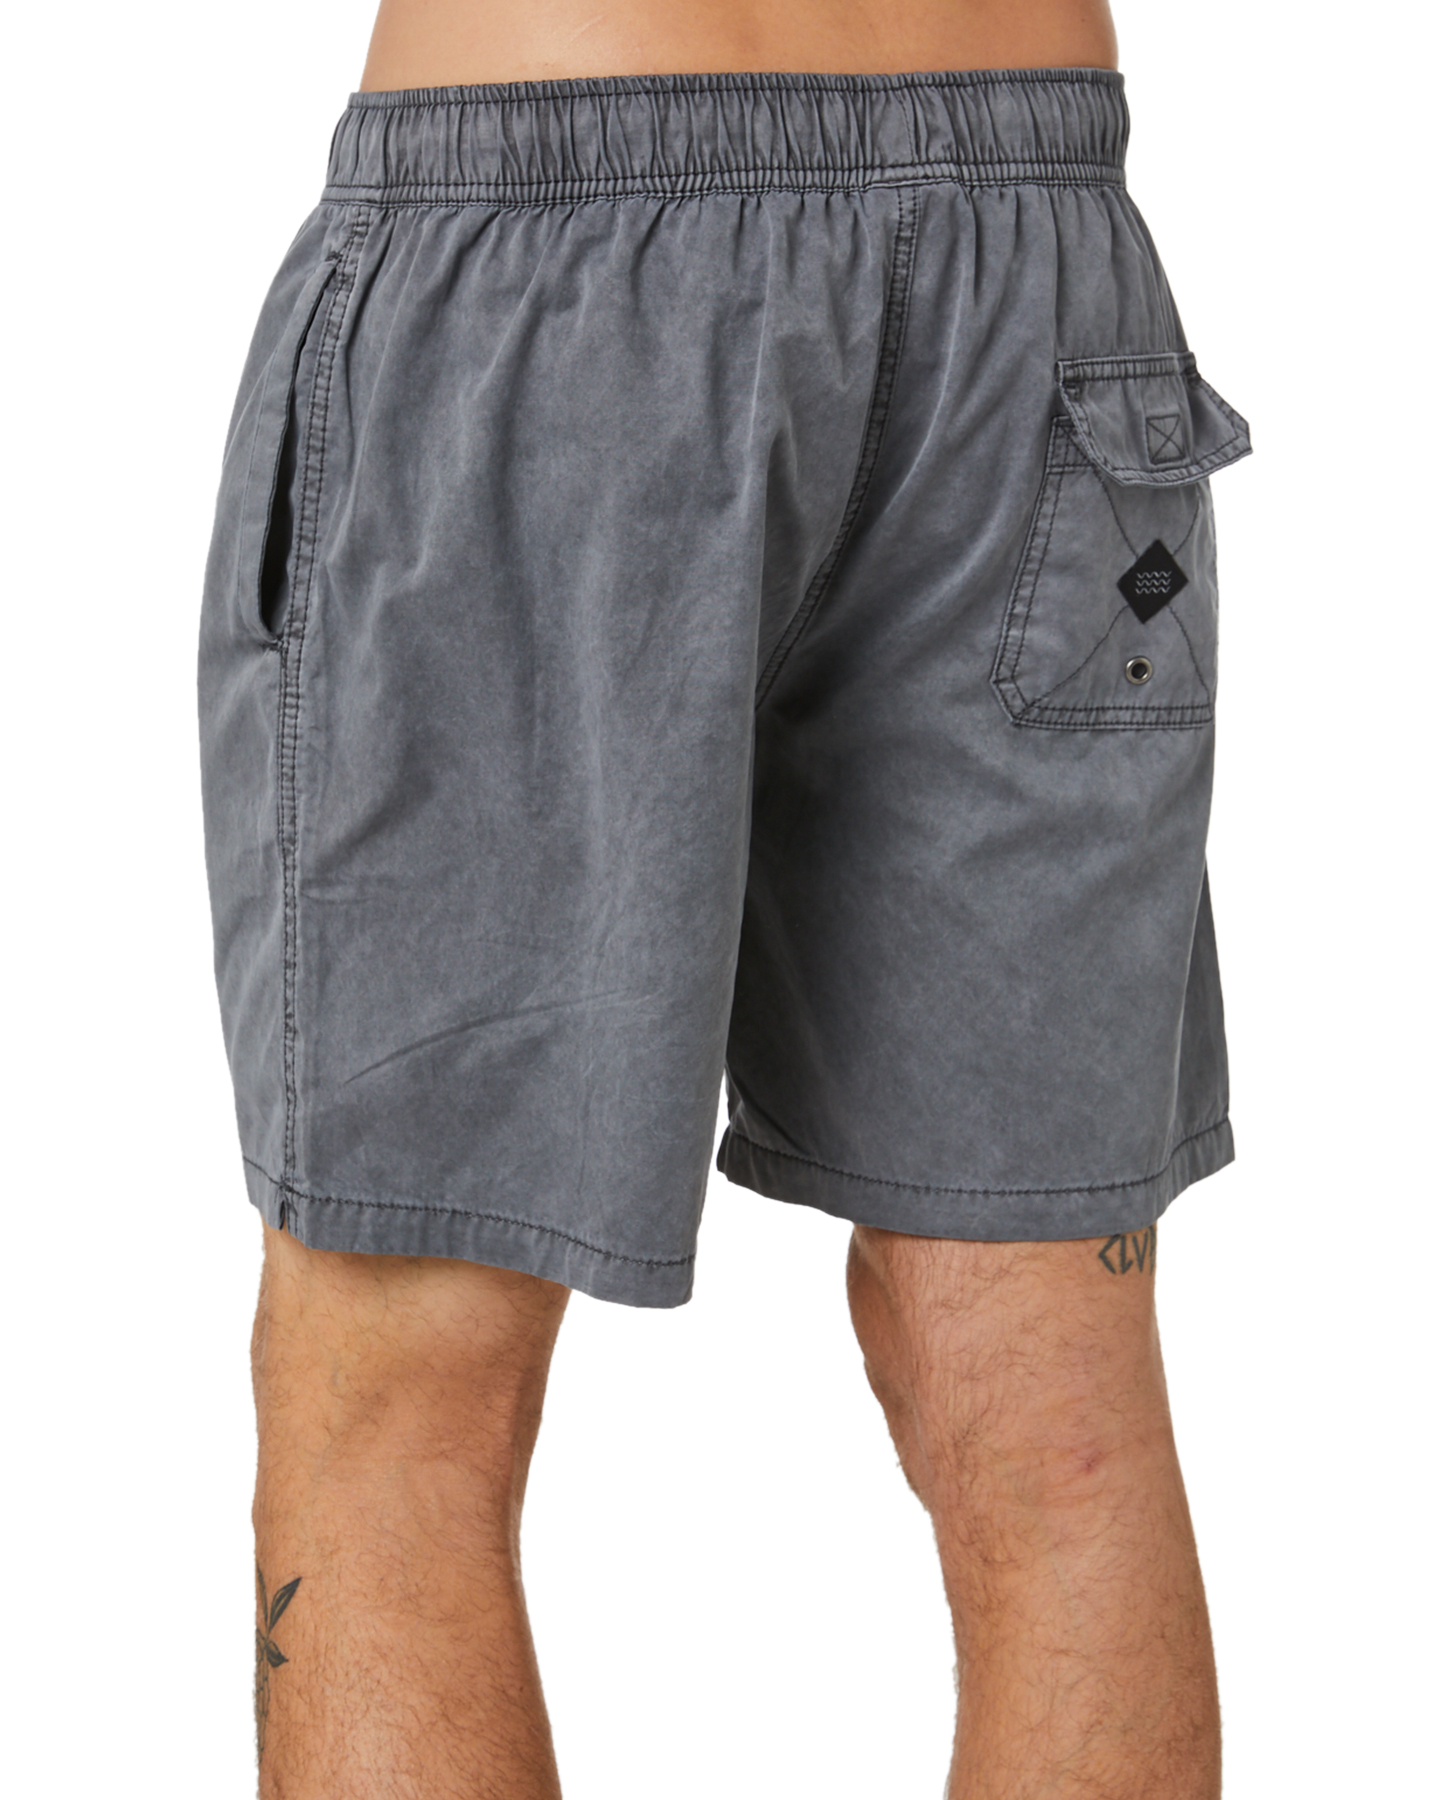 New-Swell-Men-039-s-Malibu-Mens-Beach-Short-Cotton-Polyester-Grey thumbnail 31